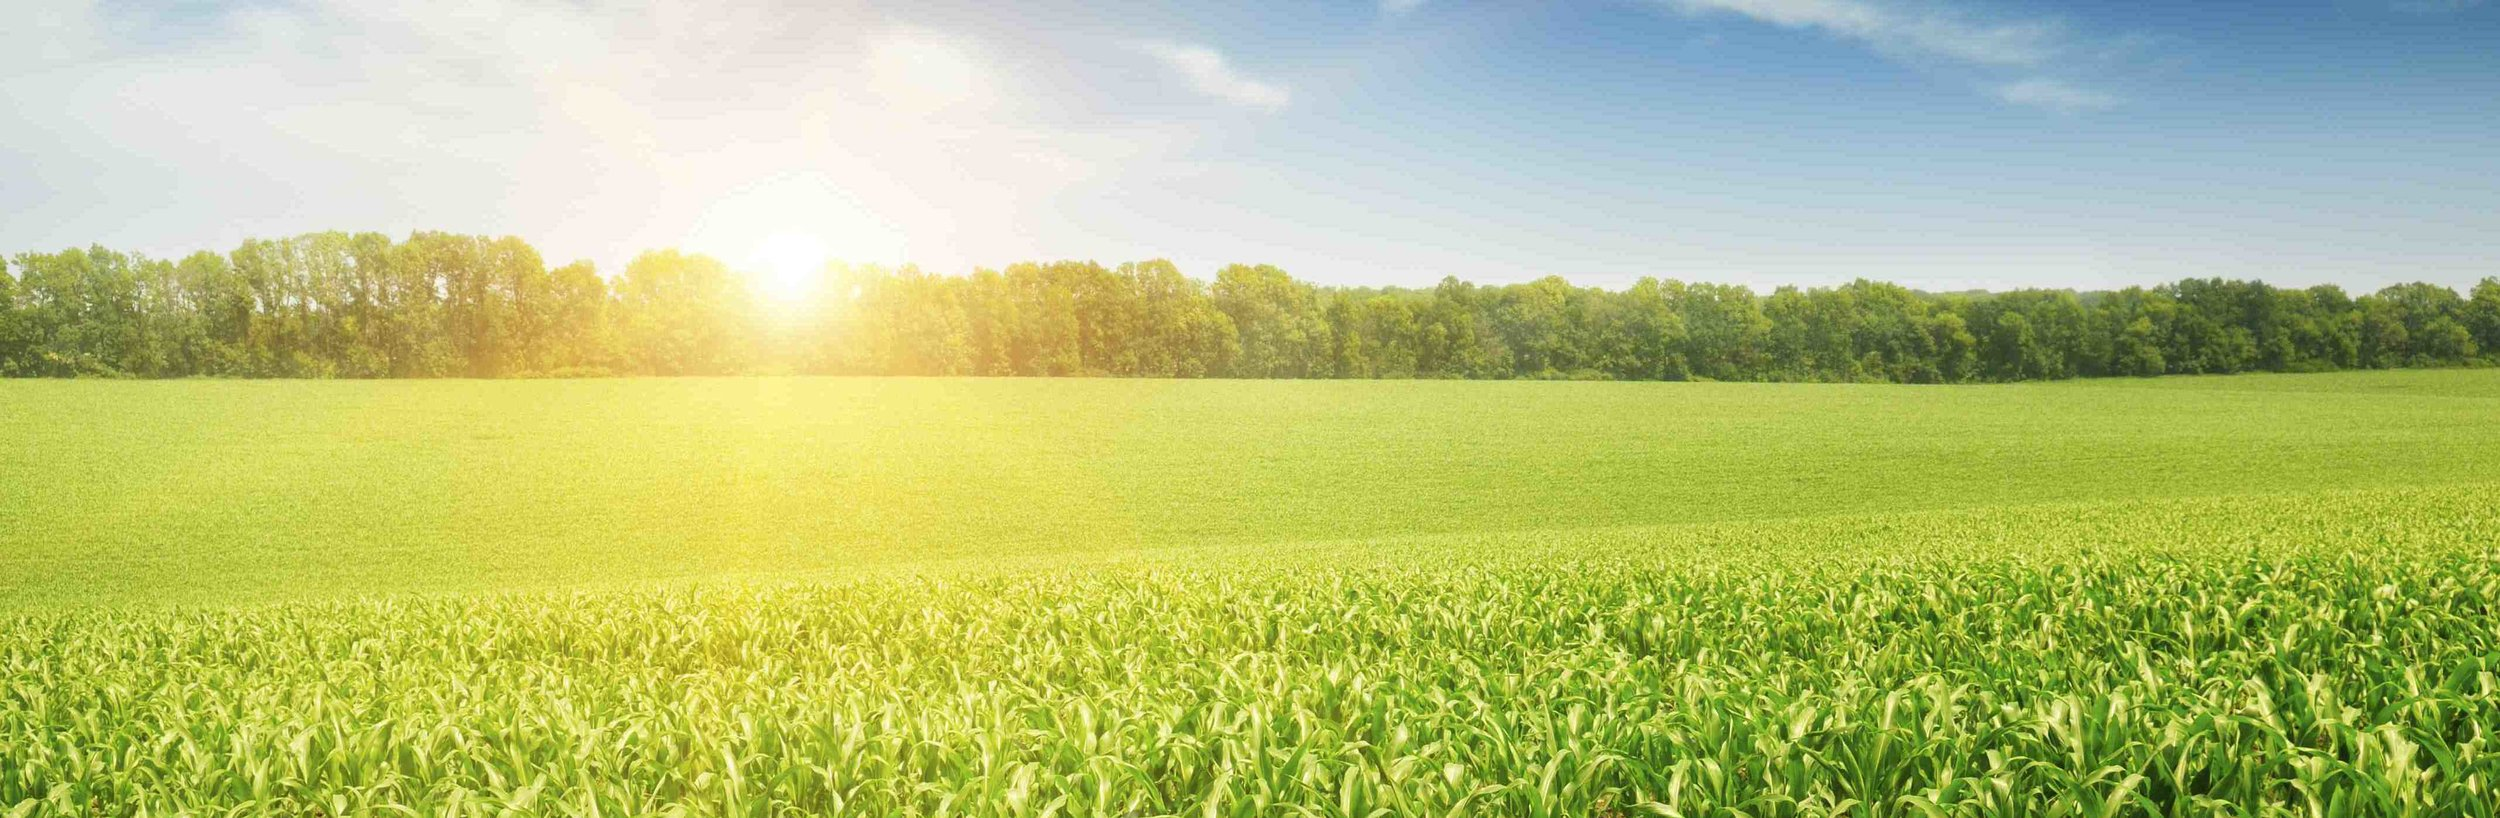 31721196-idyllic-hot-summer-morning-on-the-field.jpg